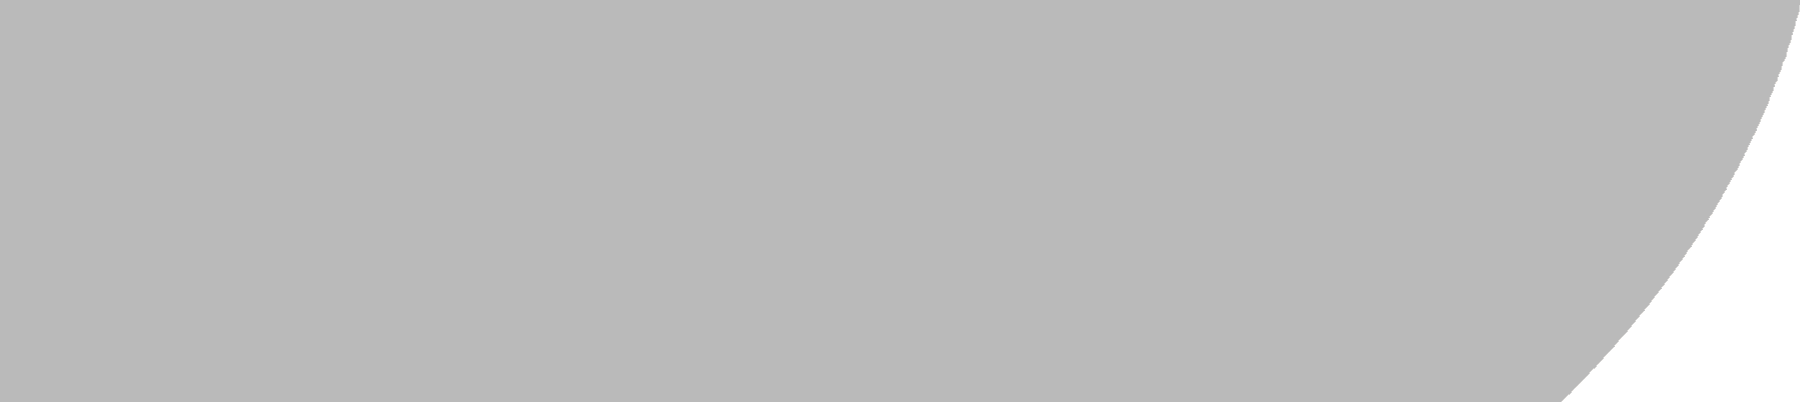 grey-bar-from-left-fw